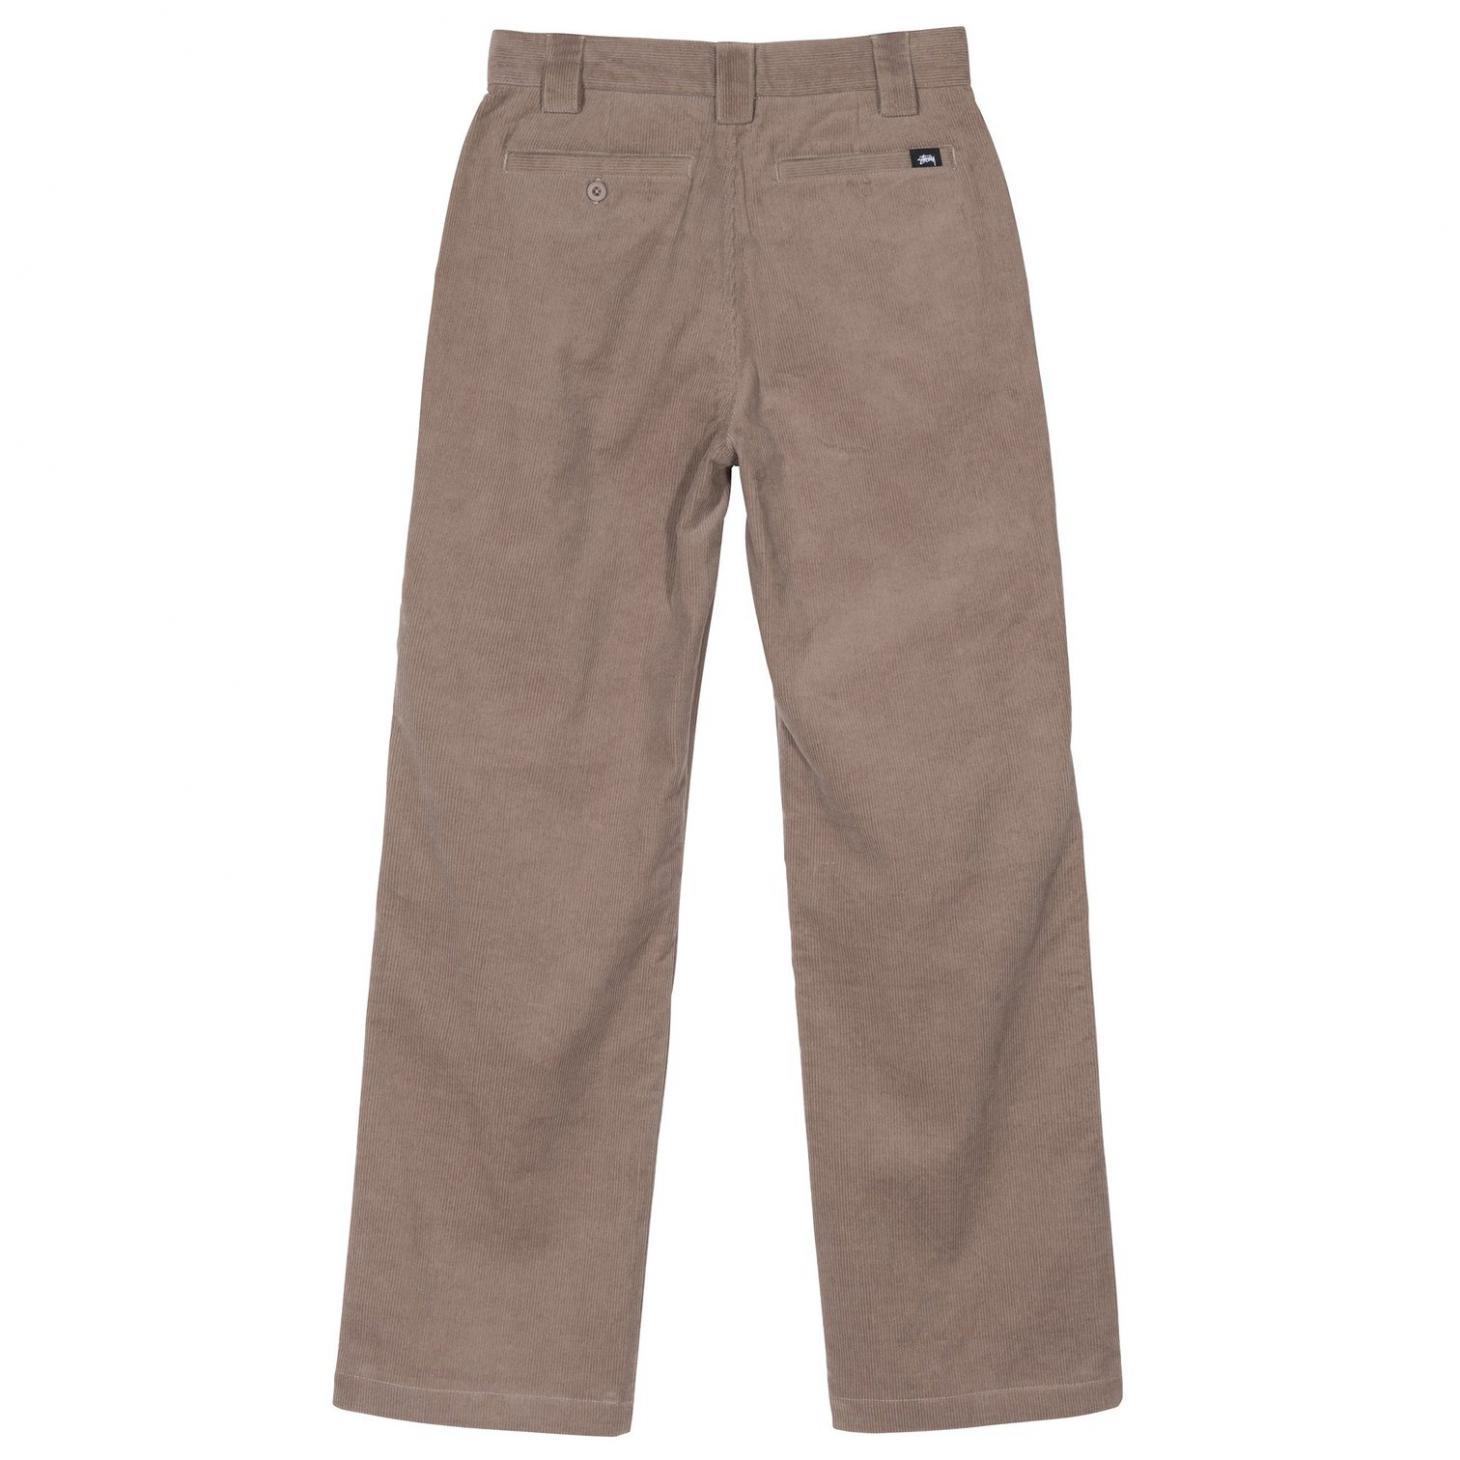 Womens Shorts & Pants | Stussy Corduroy Wide Pant Taupe ~ JemrayEnergy